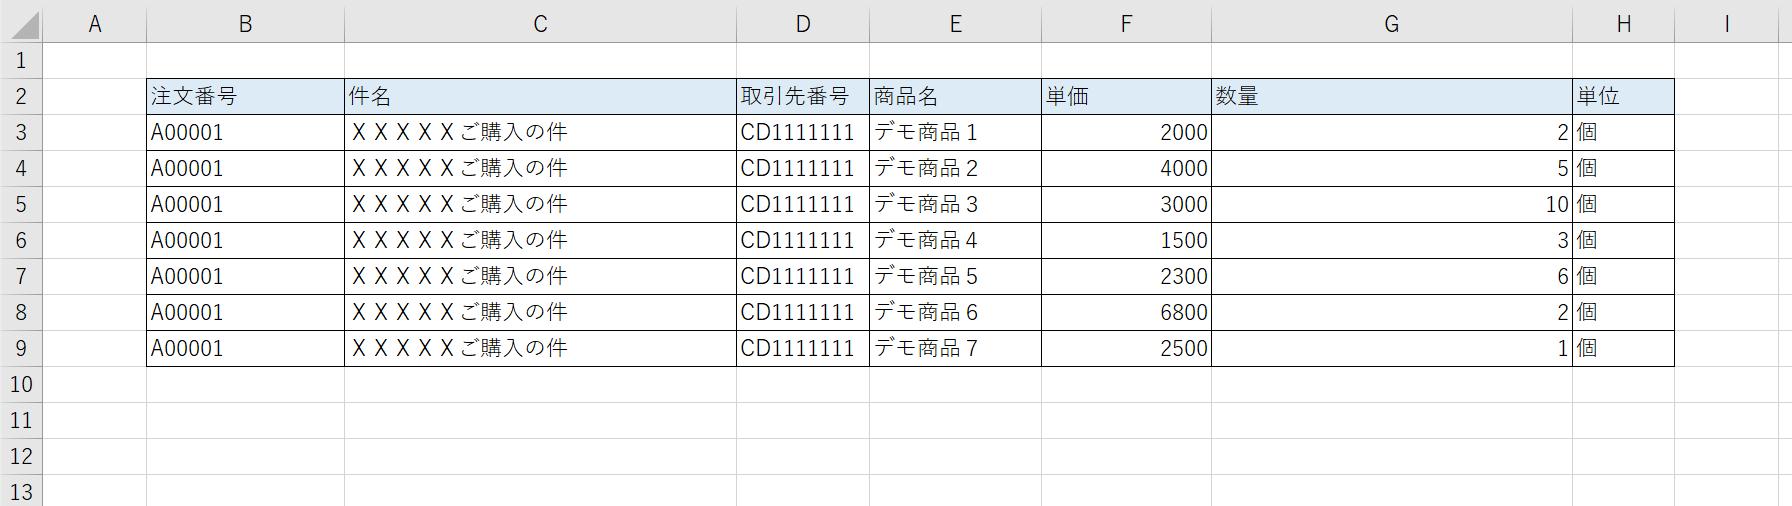 https://s3.ap-northeast-1.amazonaws.com/site.docurain.jp/blog/2021/03/スクリーンショット-2021-03-03-20.44.24.png